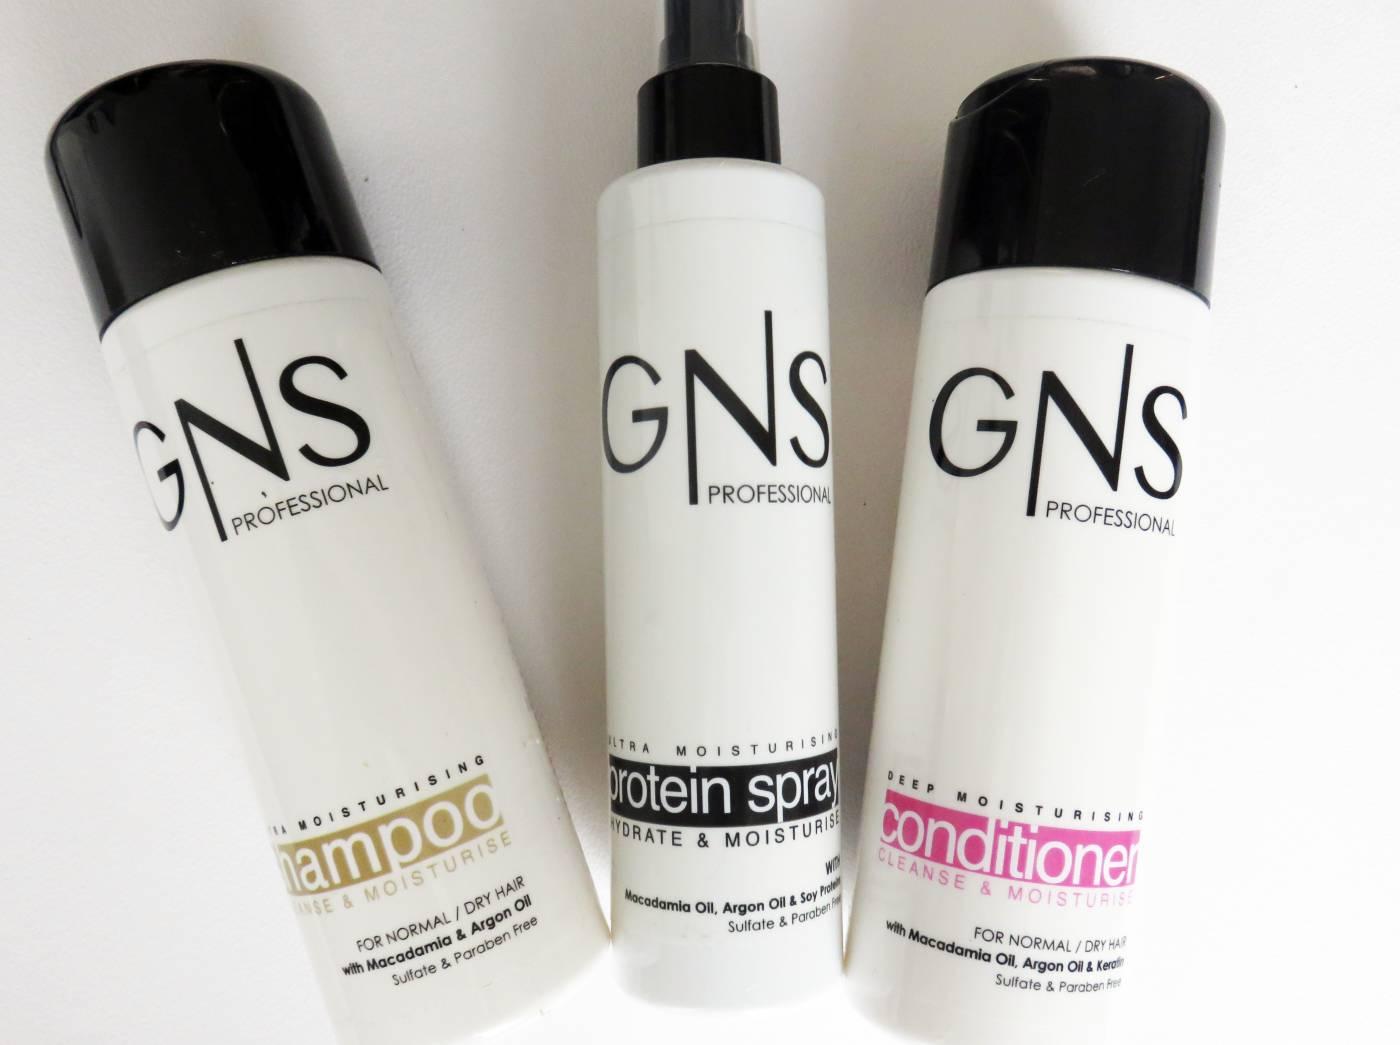 GNS Protein spray